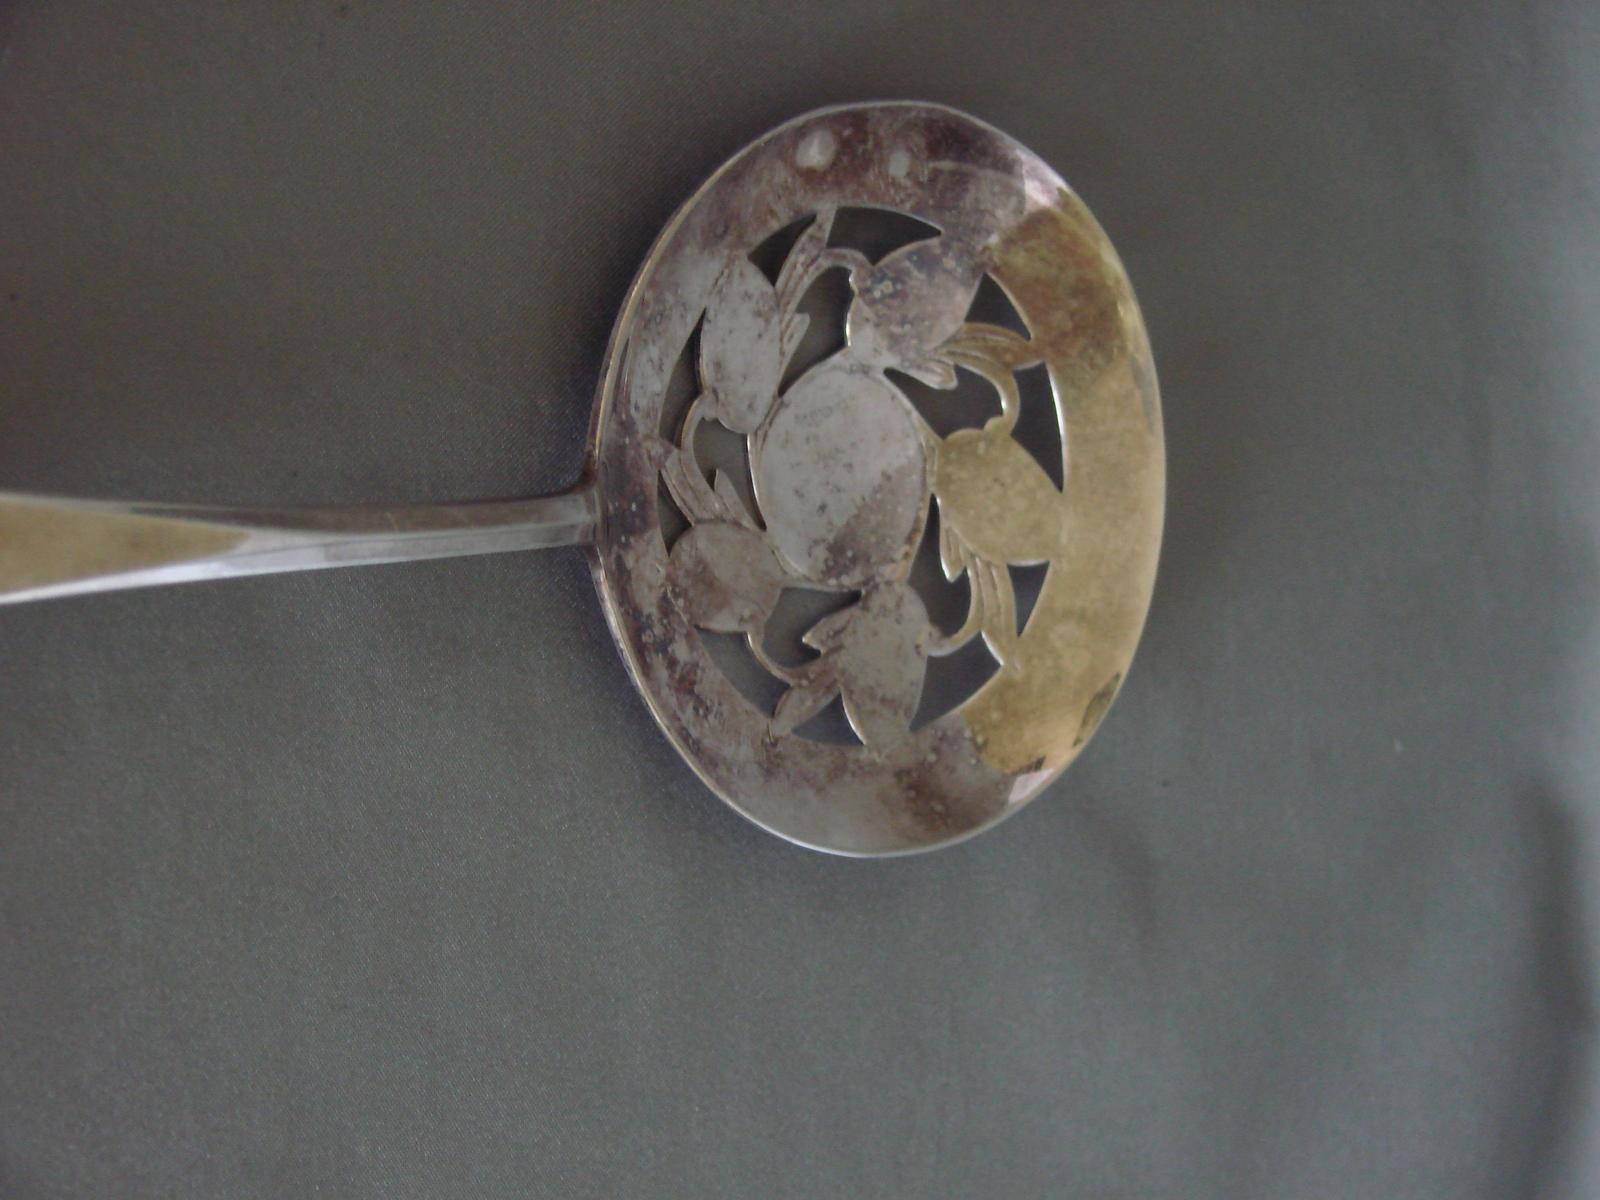 Vintage Silverplate Tomato Serving Spoon Wm. Rogers Mfg. Co. Original Rogers